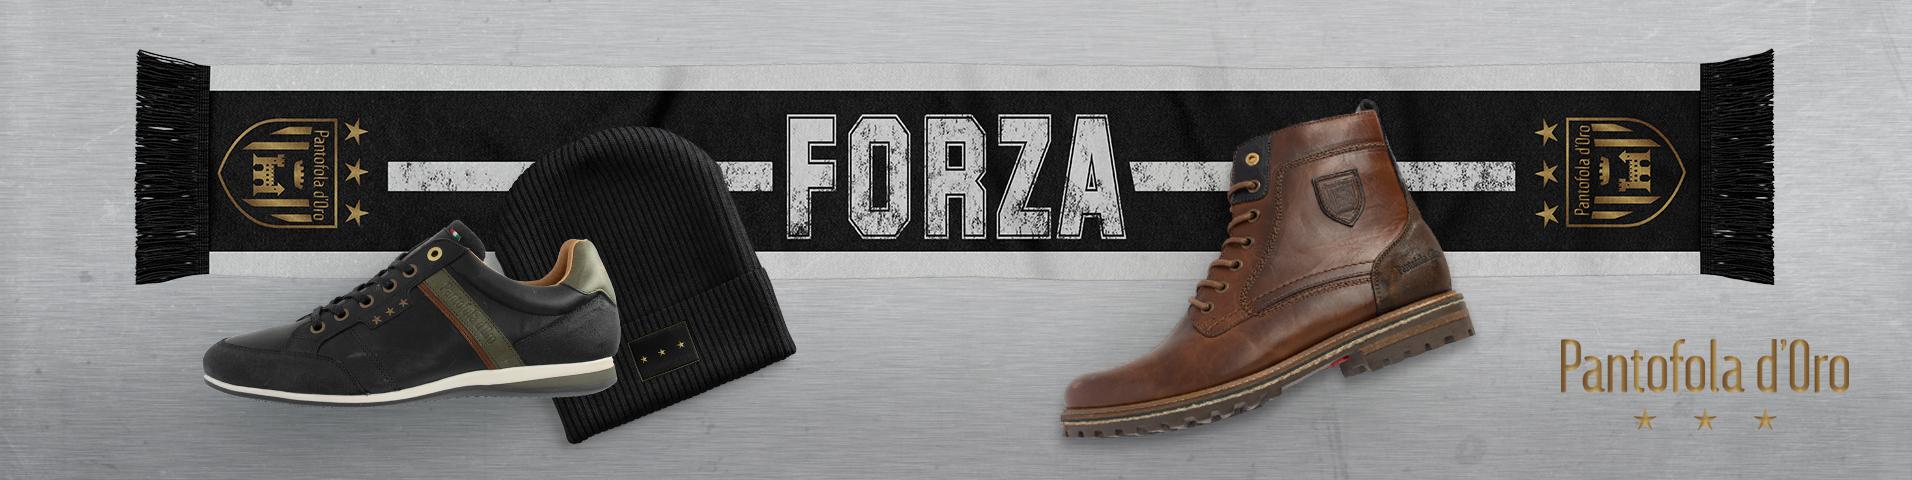 Pantofola Doro Online Shop Bestellen Bei D Island Shoes Casual Zappato England Suede Black Katalog Von